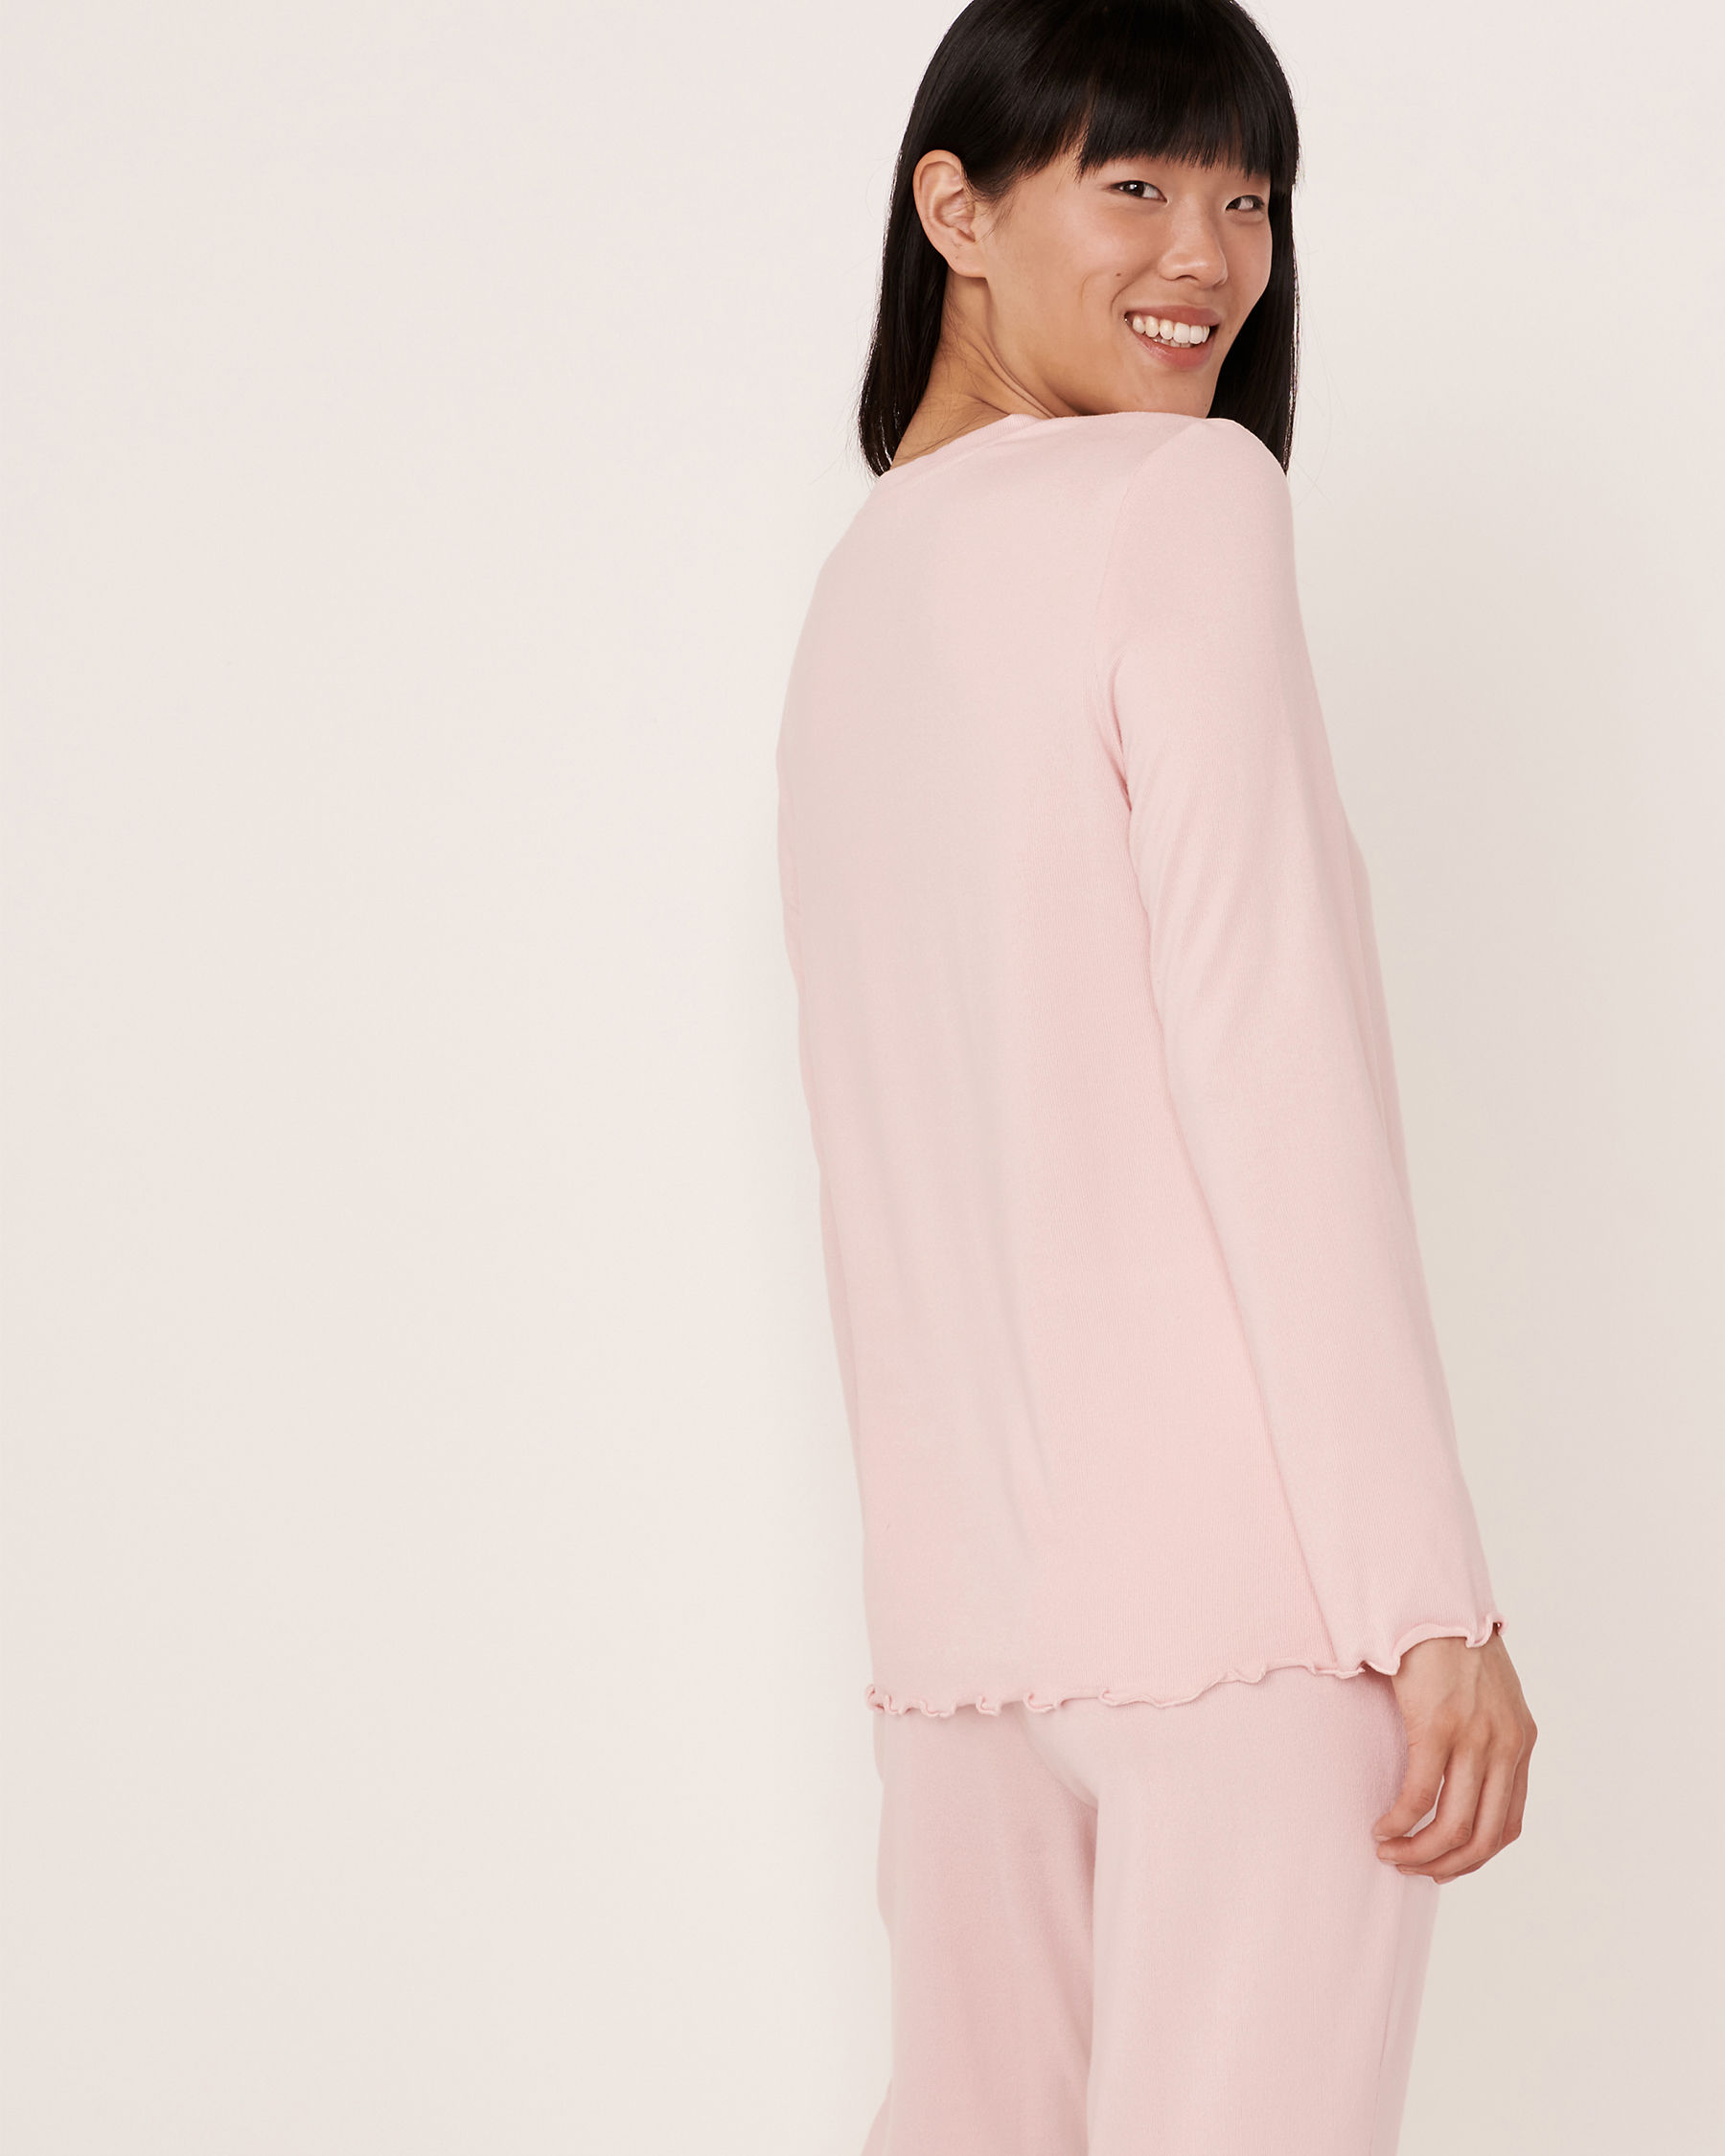 LA VIE EN ROSE Recycled Fibers Henley Long Sleeve Shirt Light pink 40100091 - View2